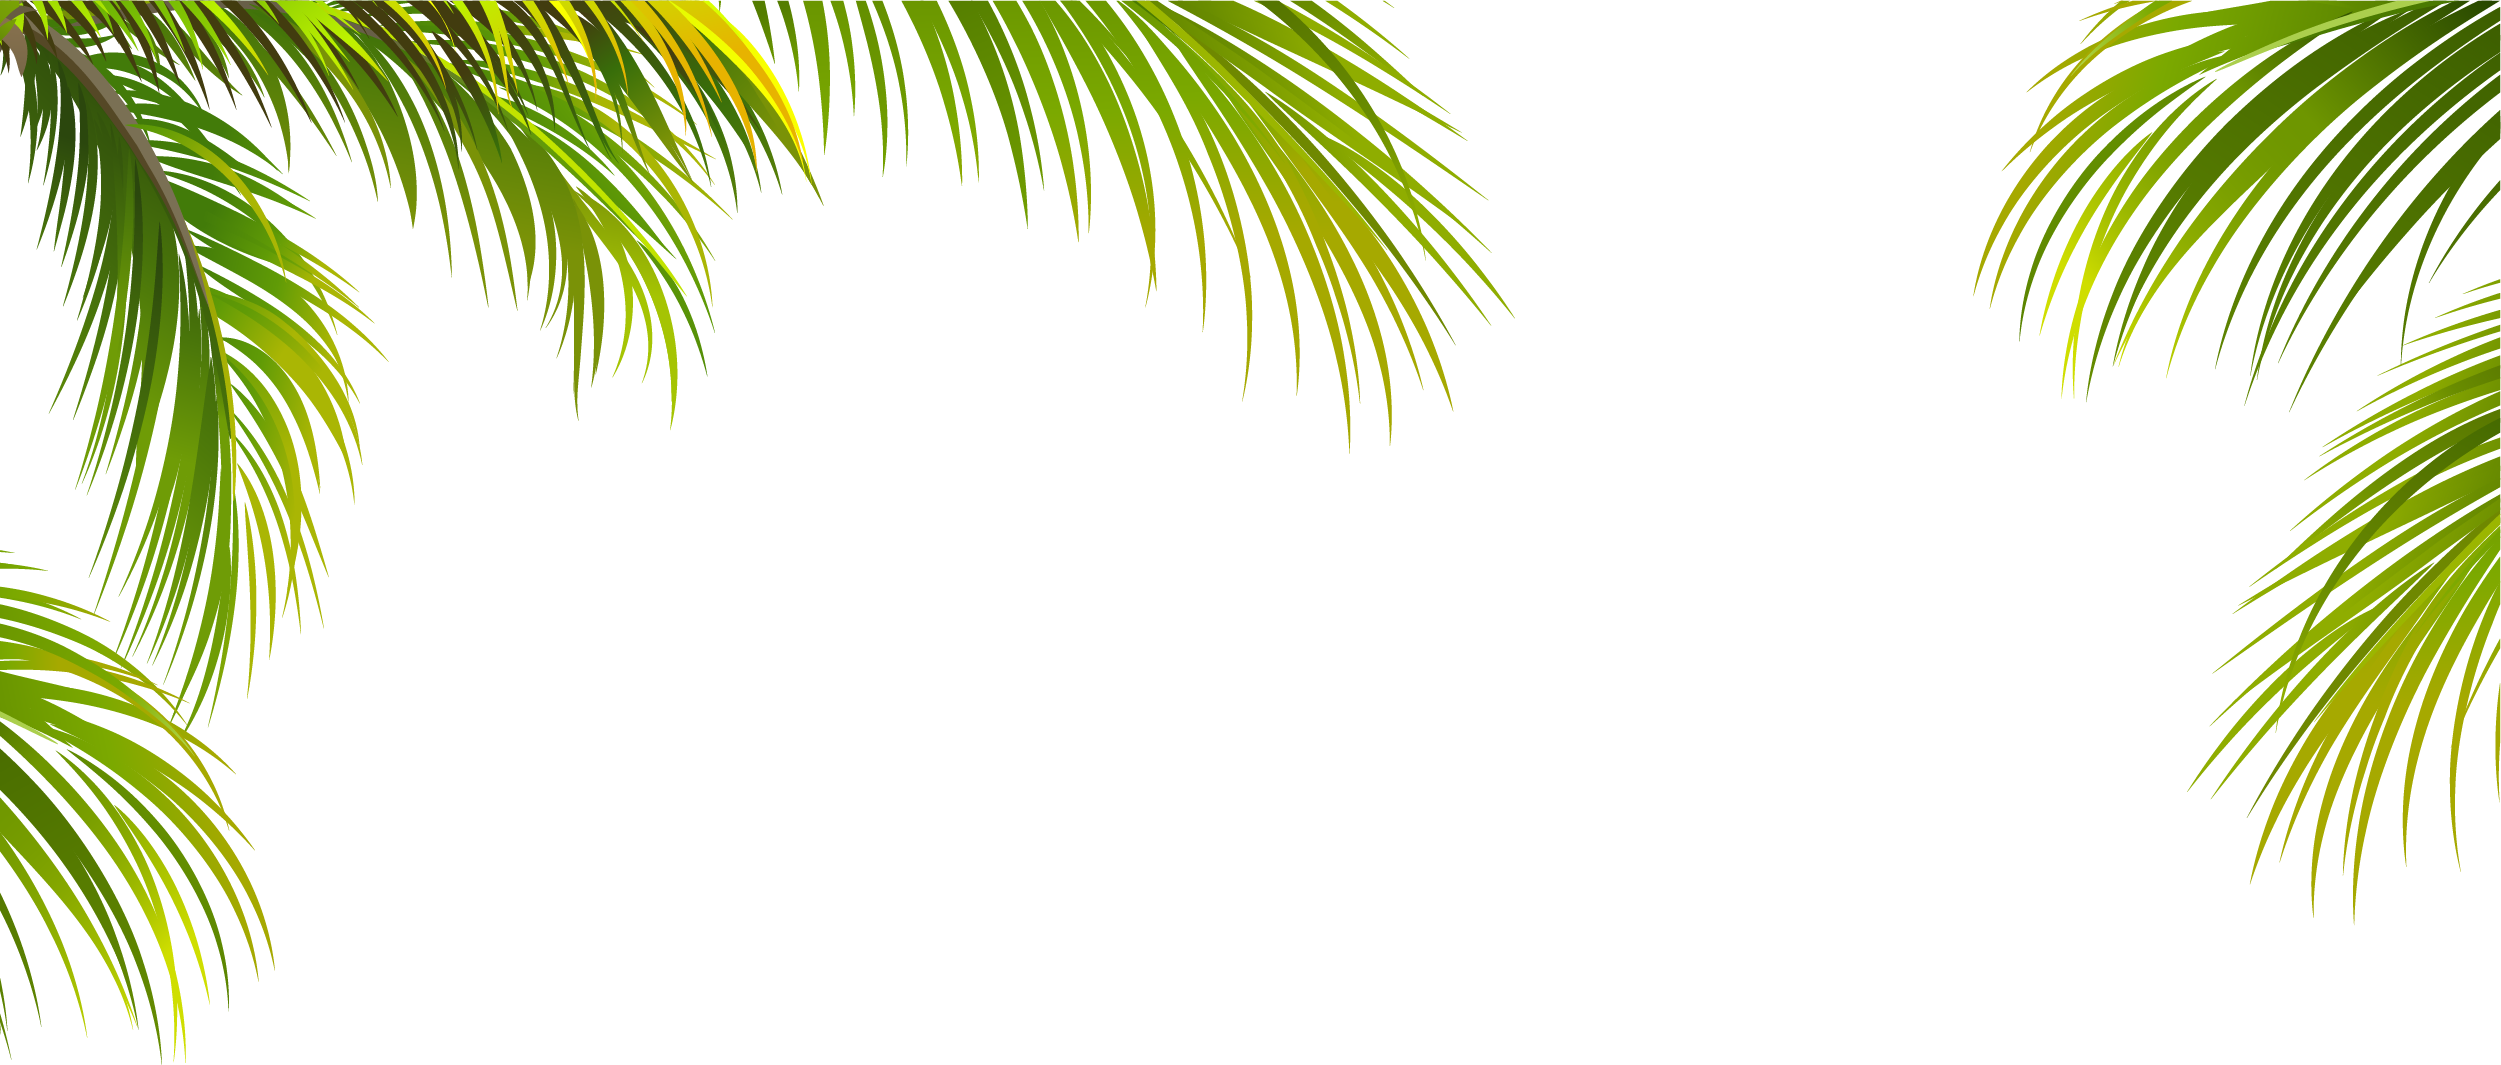 Coconut arecaceae tree green. Leaf border png